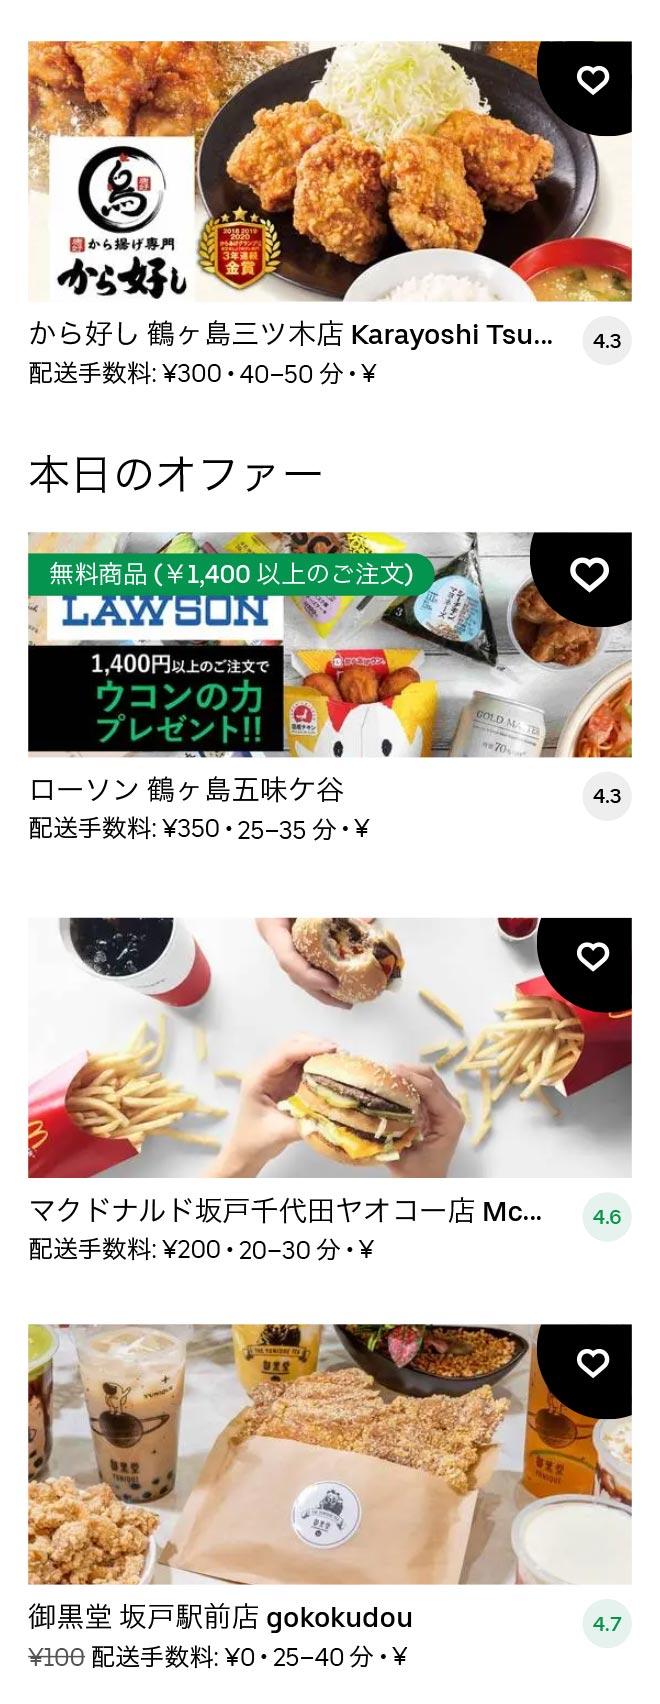 Sakado menu 2101 10